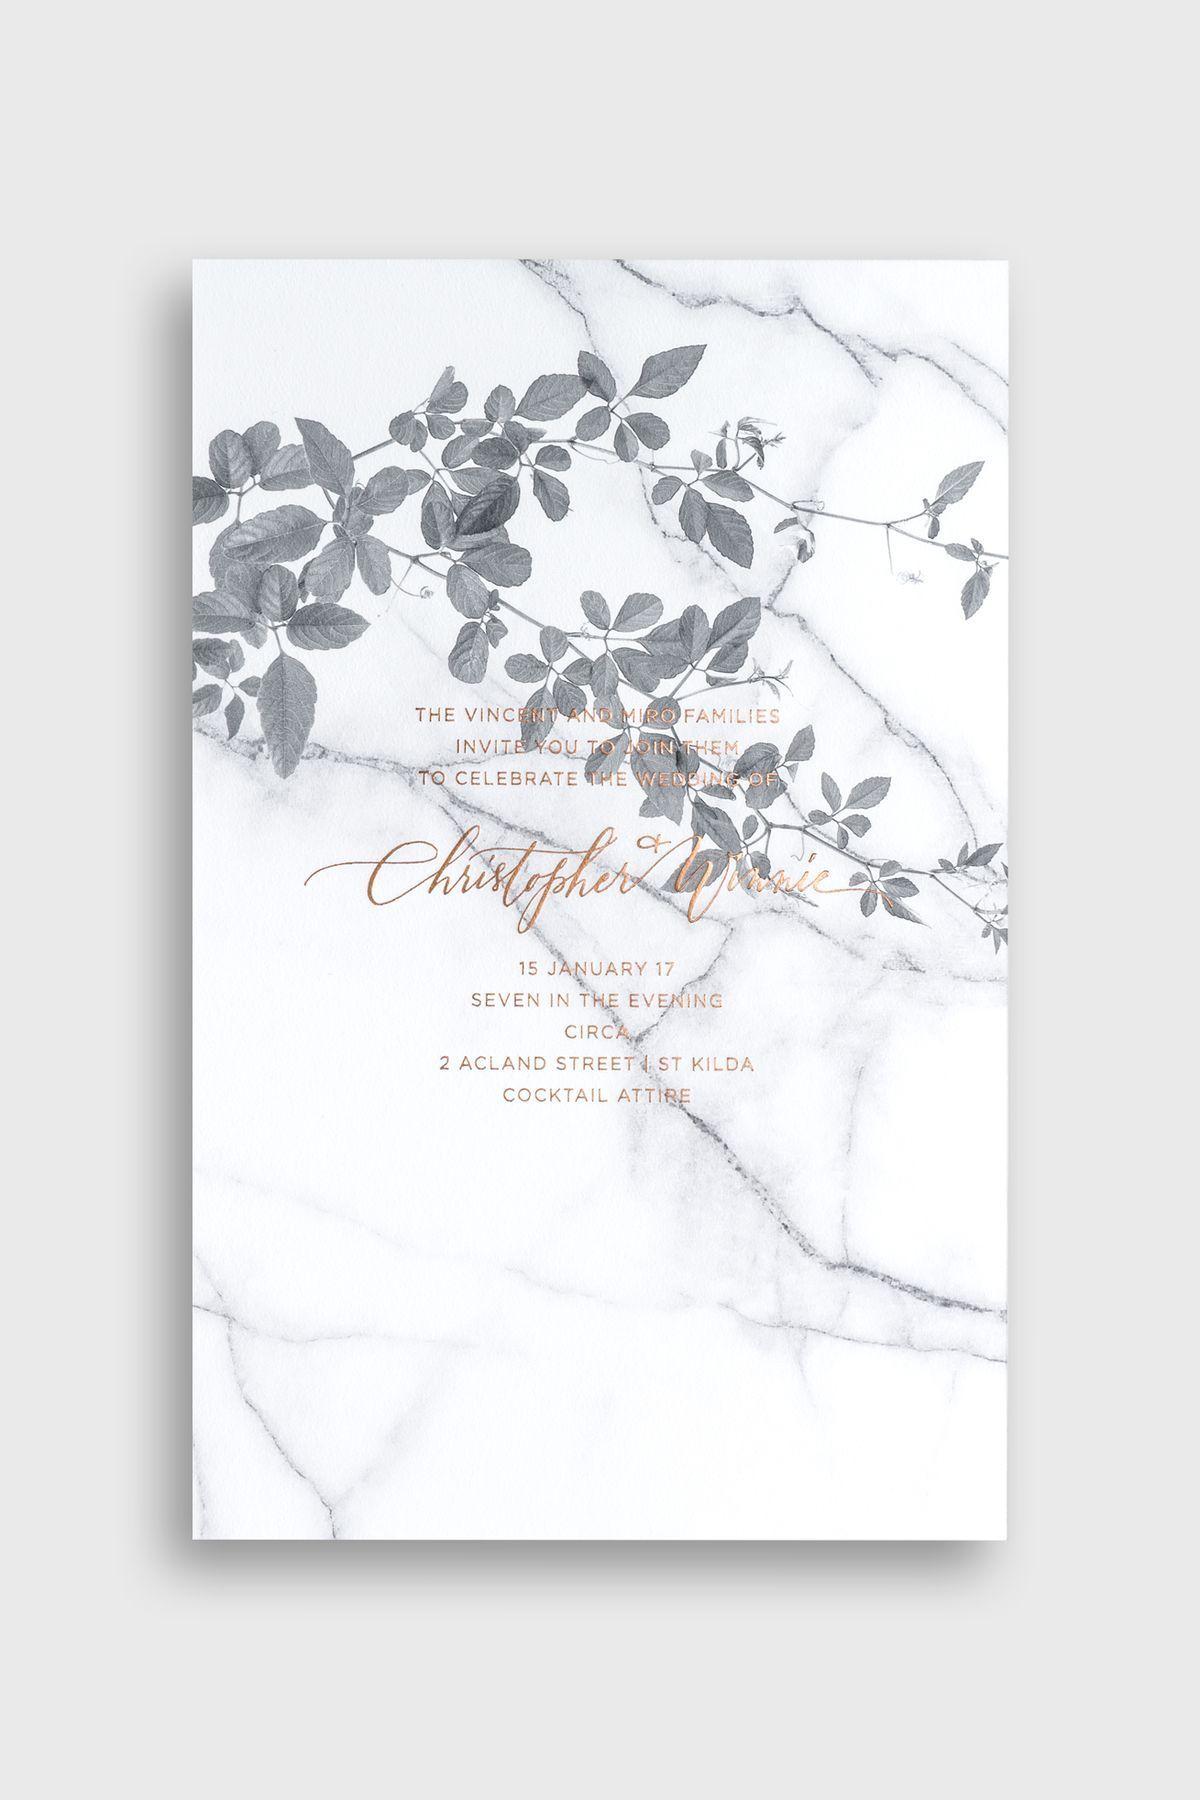 14 modern botanical wedding invitations you will love | Wedding ...